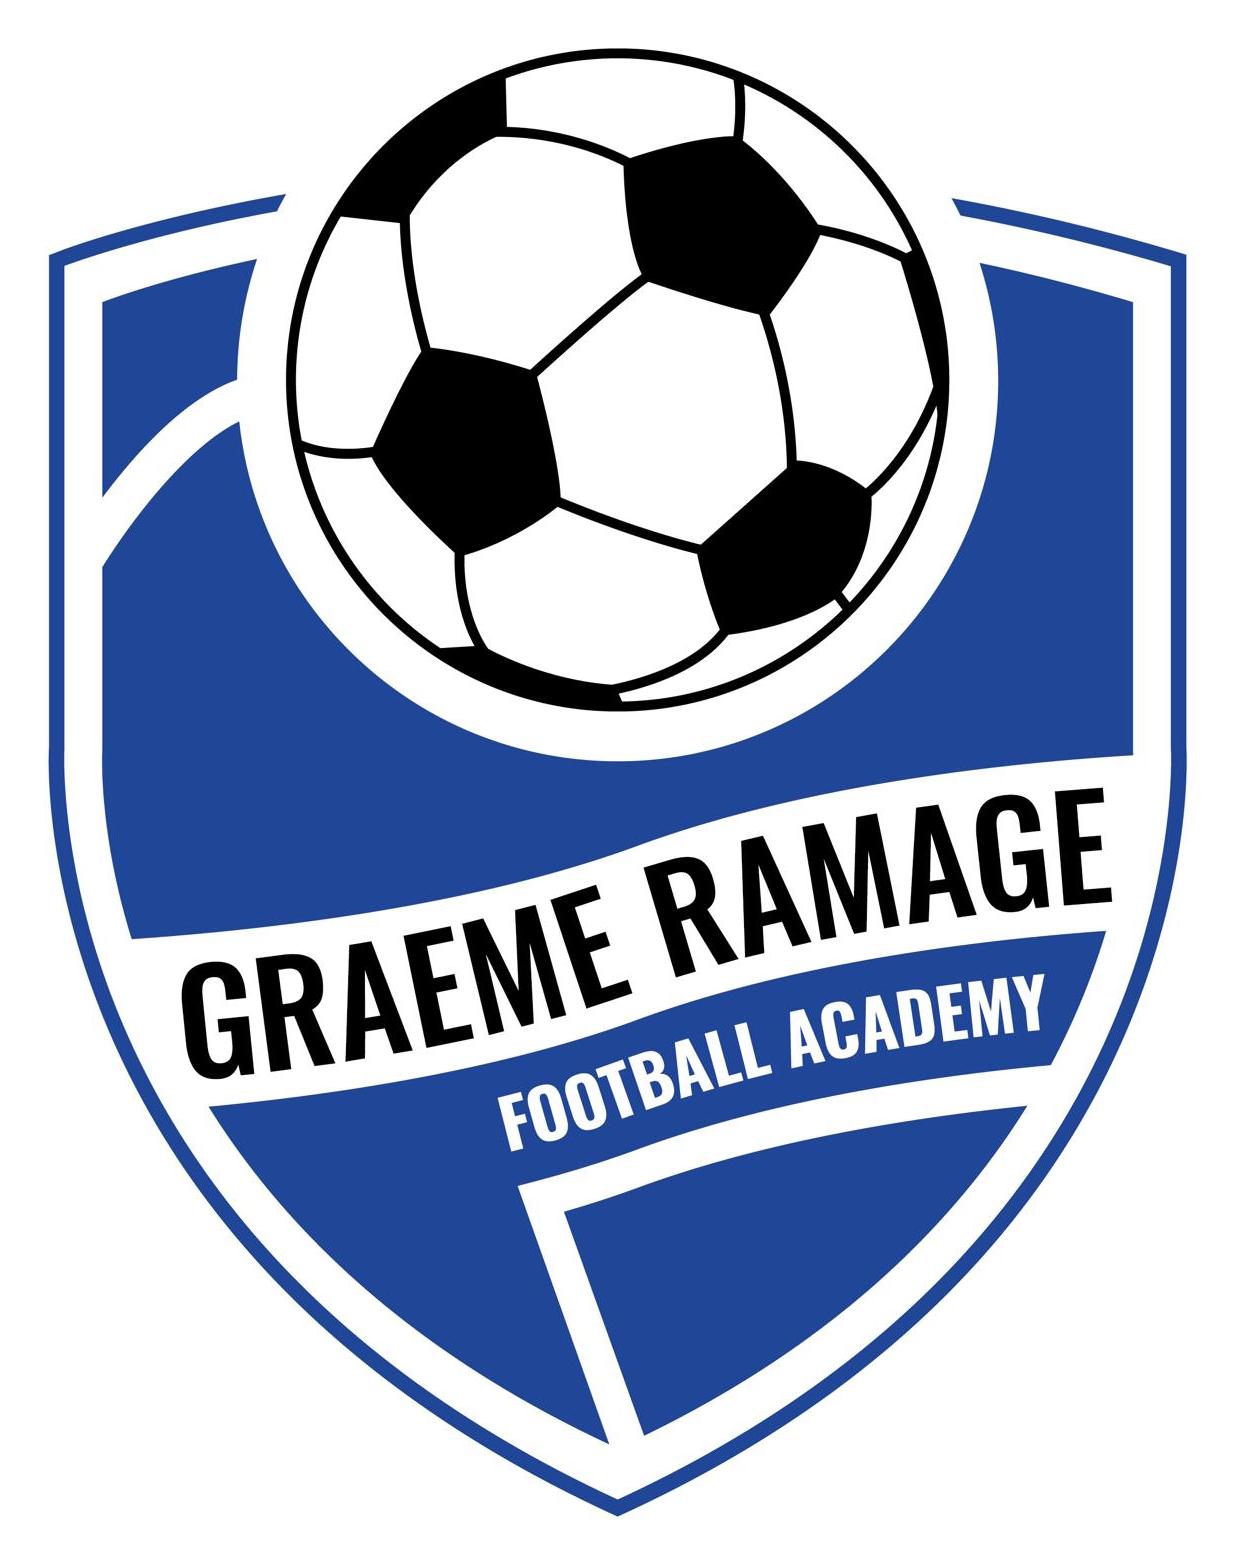 Graeme Ramage Football Academy badge